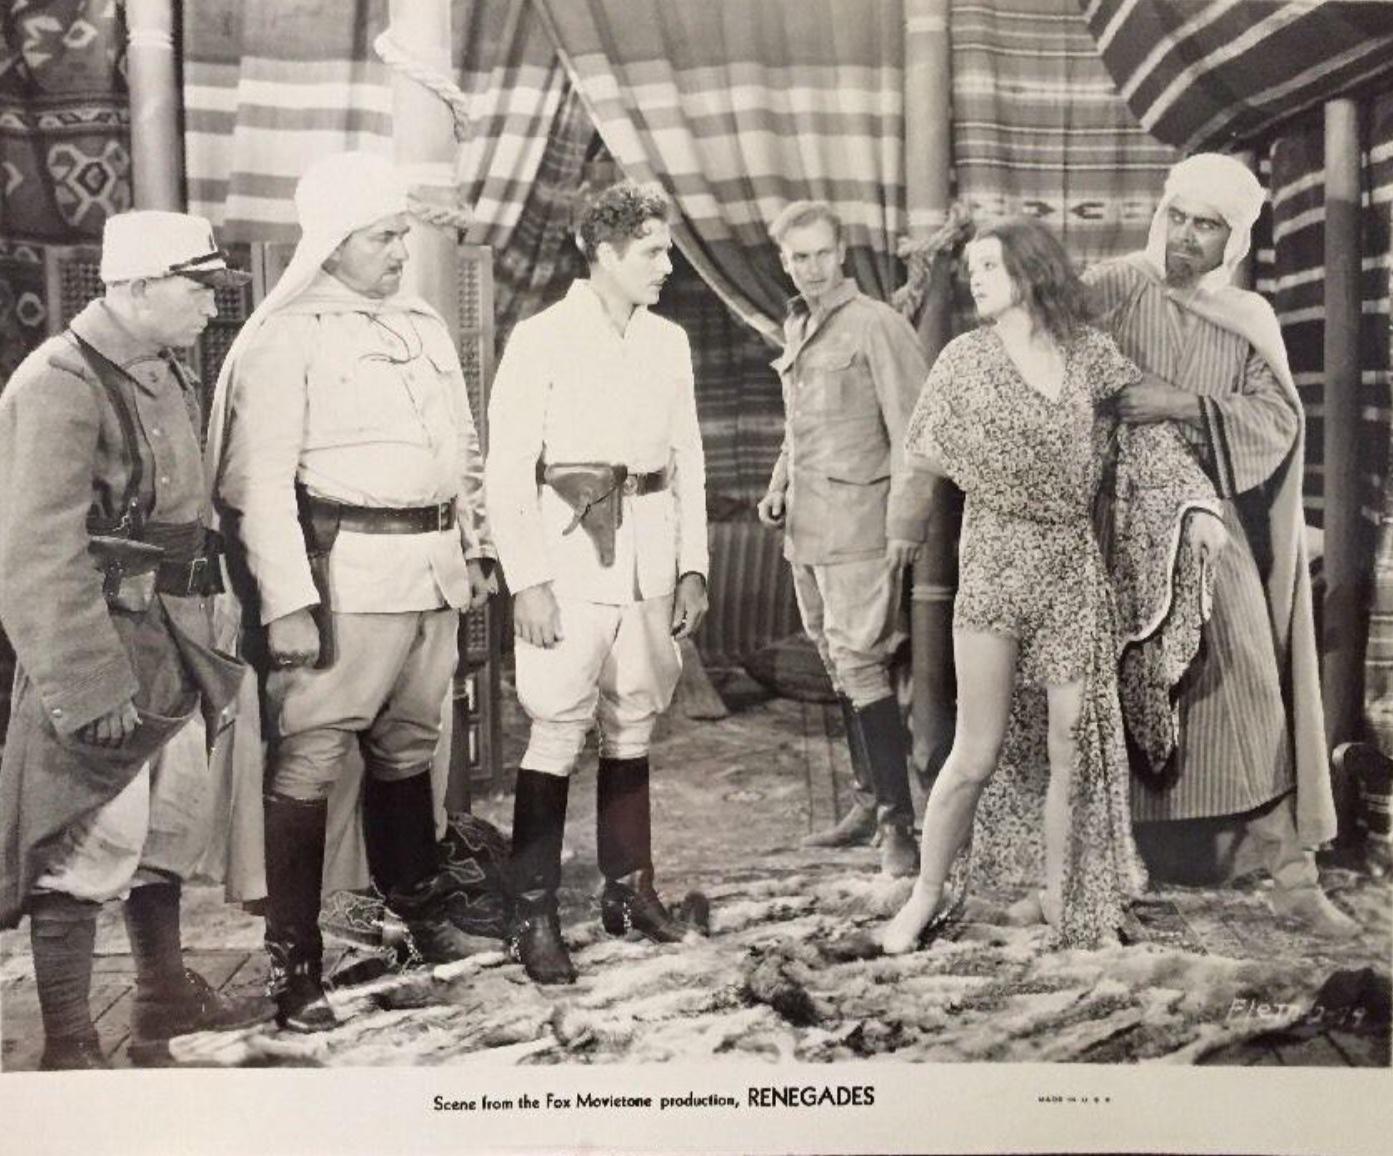 Myrna Loy, Noah Beery, Warner Baxter, and Gregory Gaye in Renegades (1930)